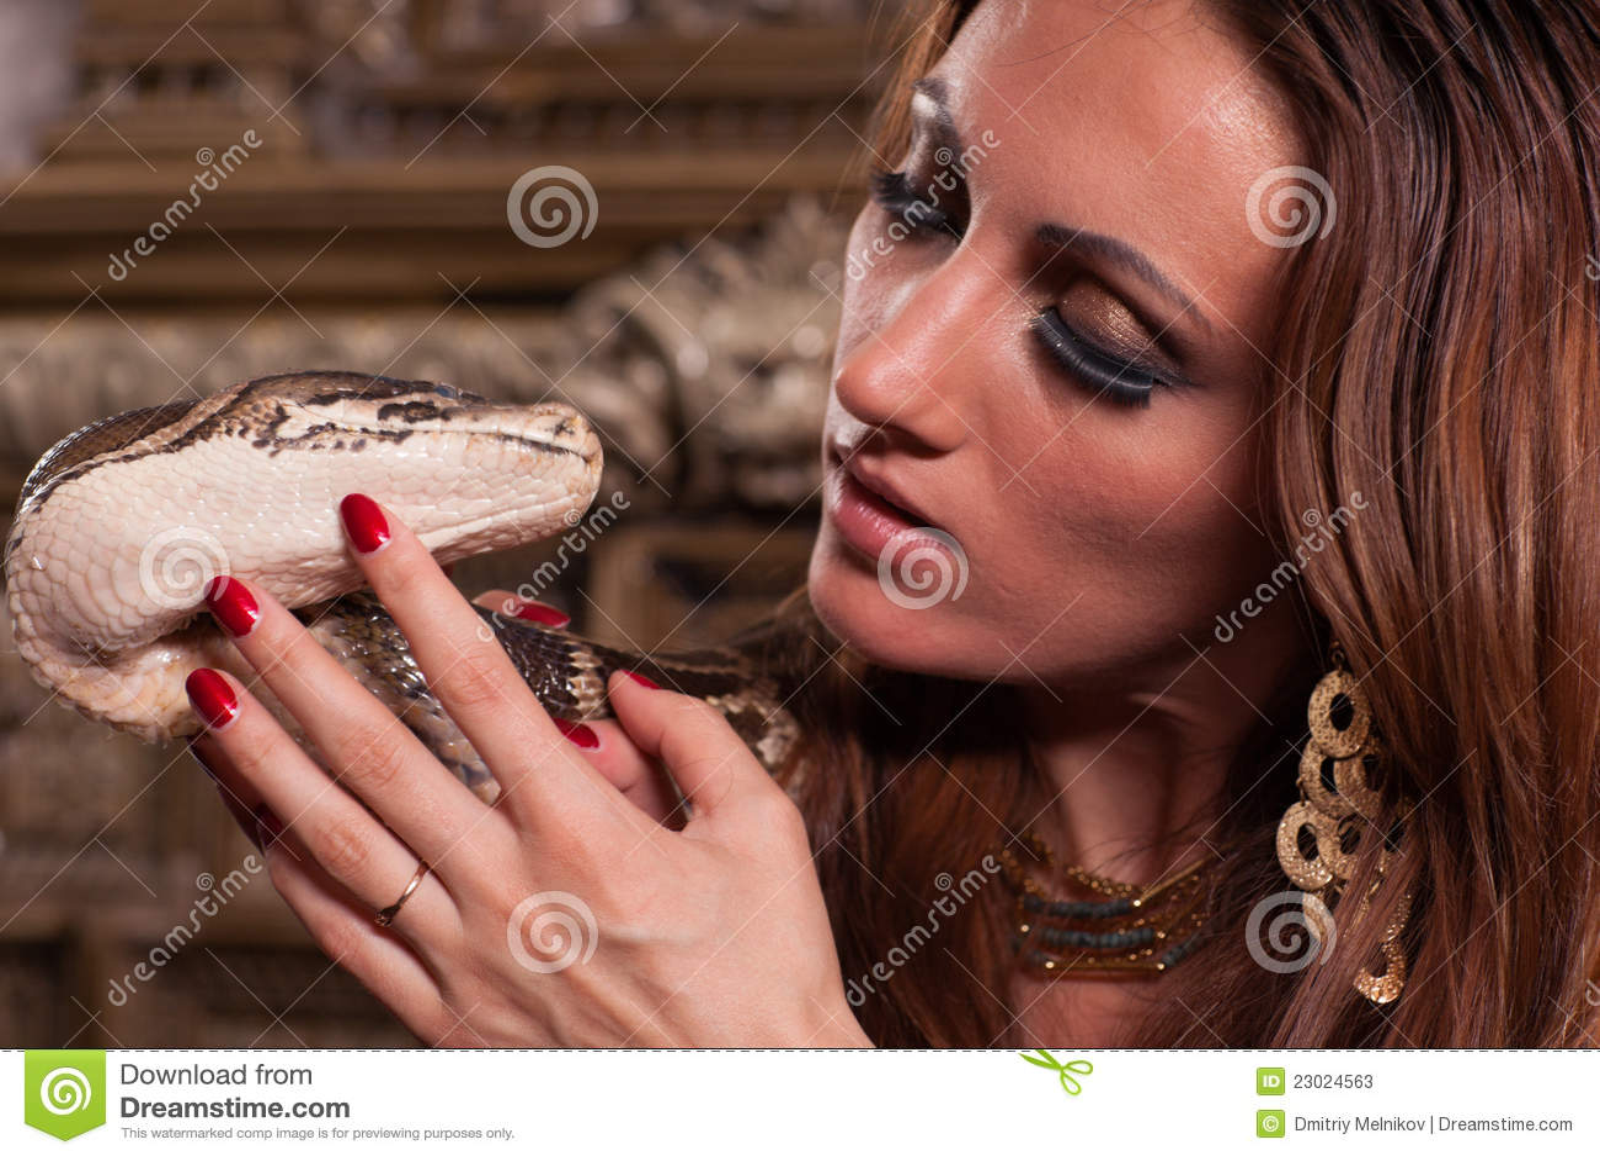 Photos de serpents porno